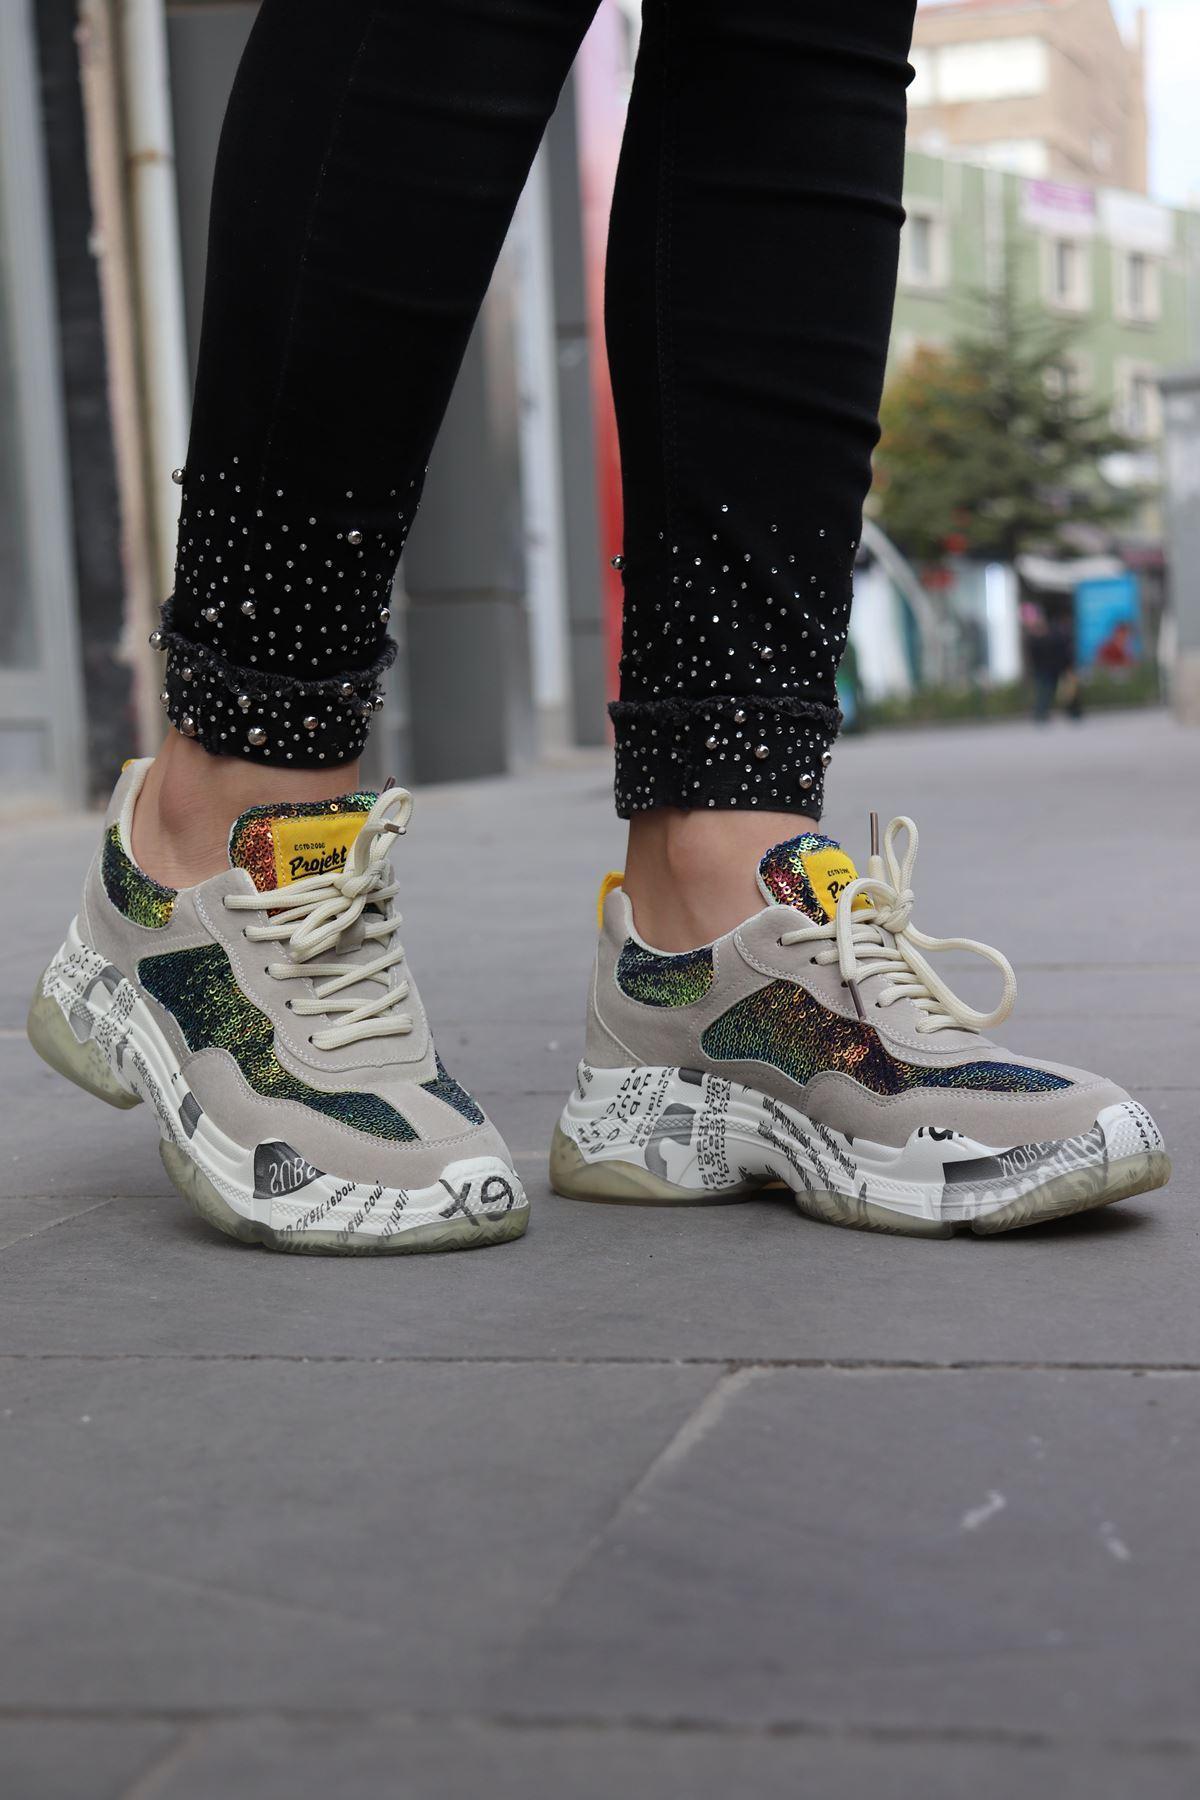 Guja - Bej Rengi Kadın Sneakers